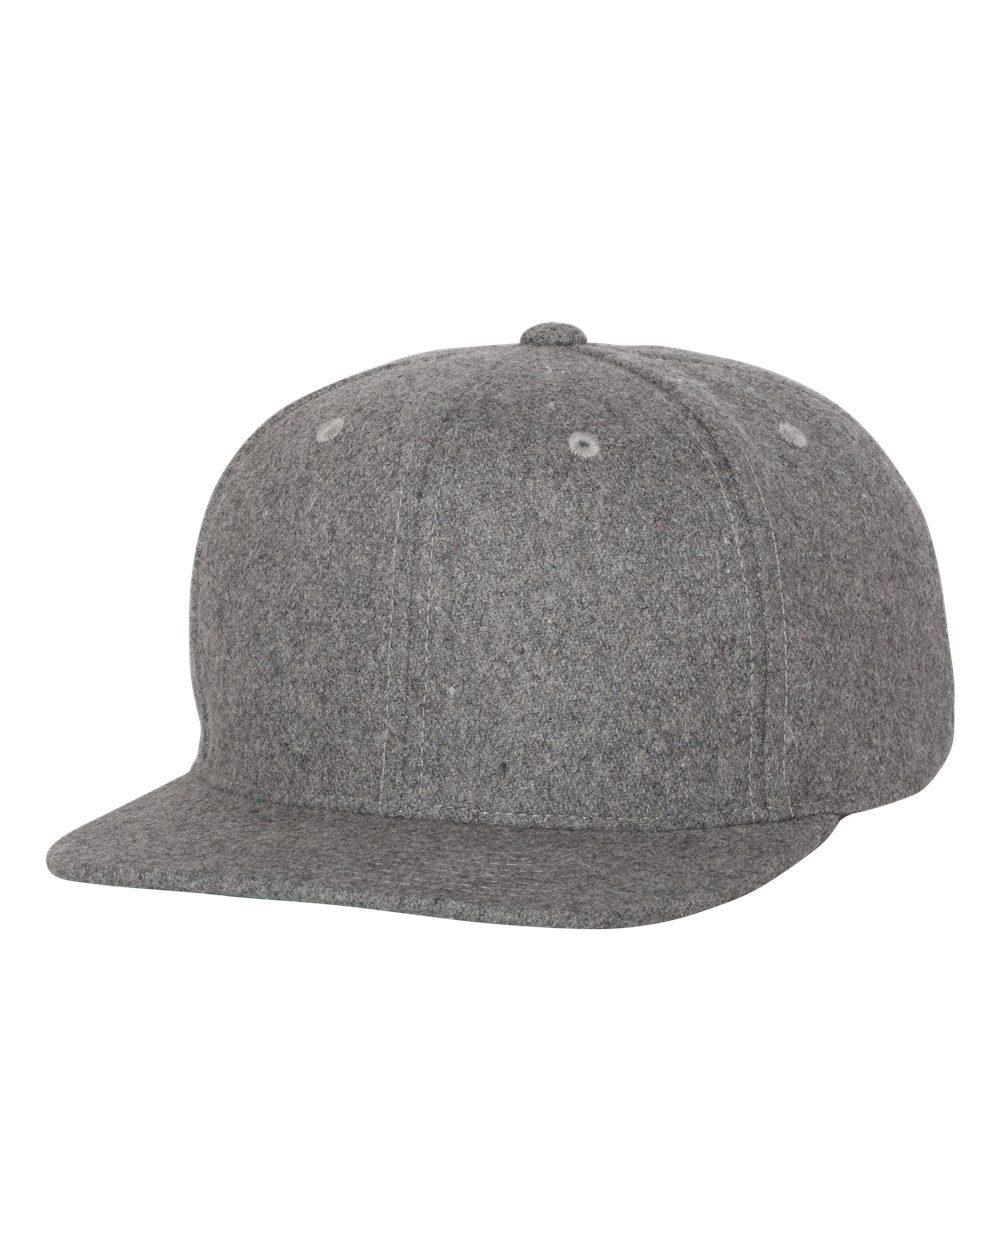 YP Classics 6689 - Melton Wool Blend Snapback Cap